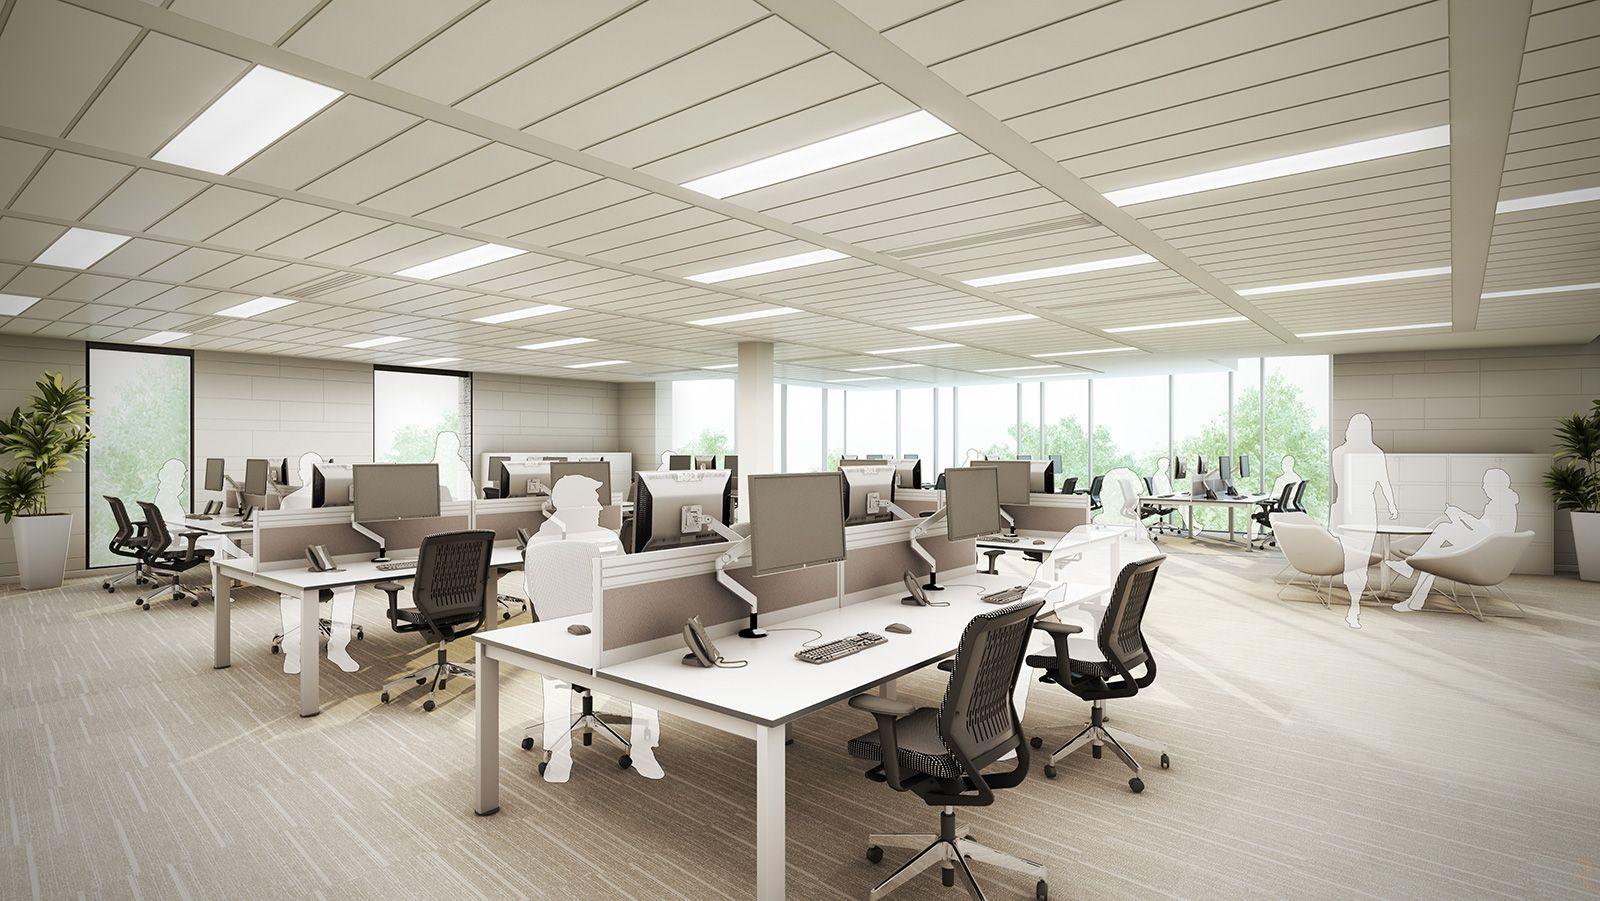 Rekomendasi Bagus Sewa Kantor Di Jakarta Pusat Commercial Space For Rent Bars For Home Office Interior Design